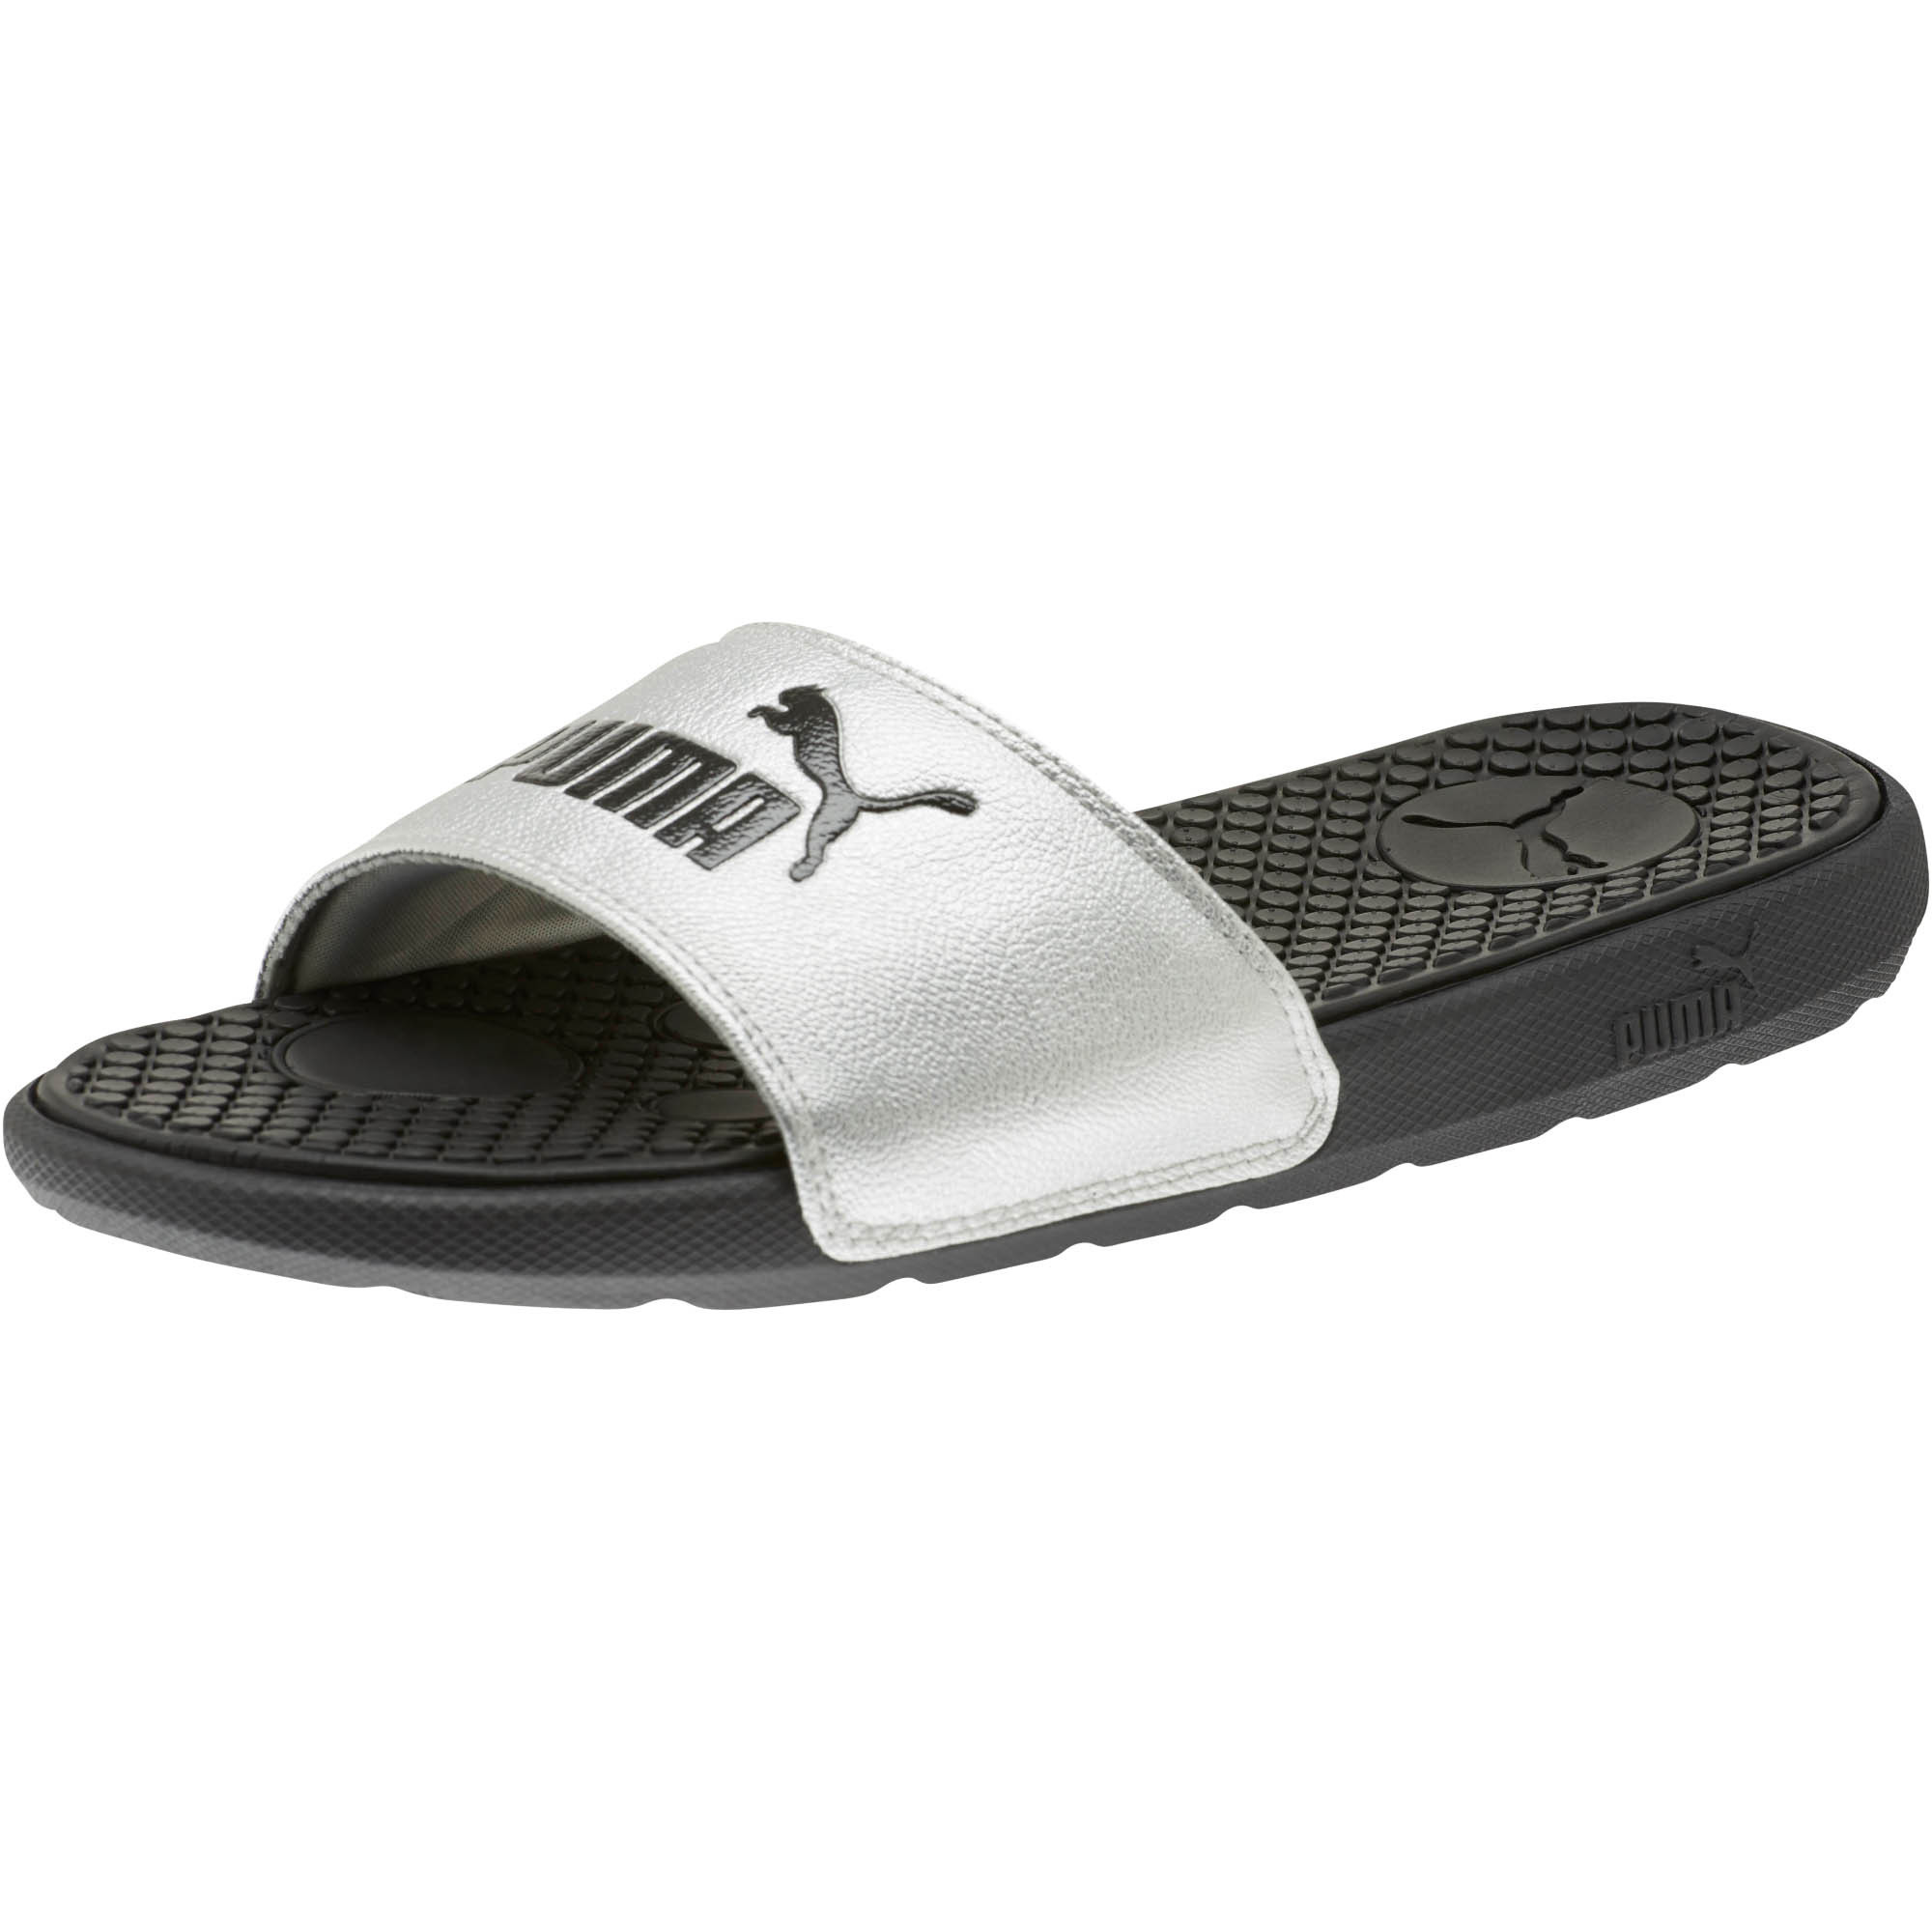 PUMA-Cool-Cat-Metallic-Women-s-Slides-Women-Sandal-Swimming-Beach thumbnail 9